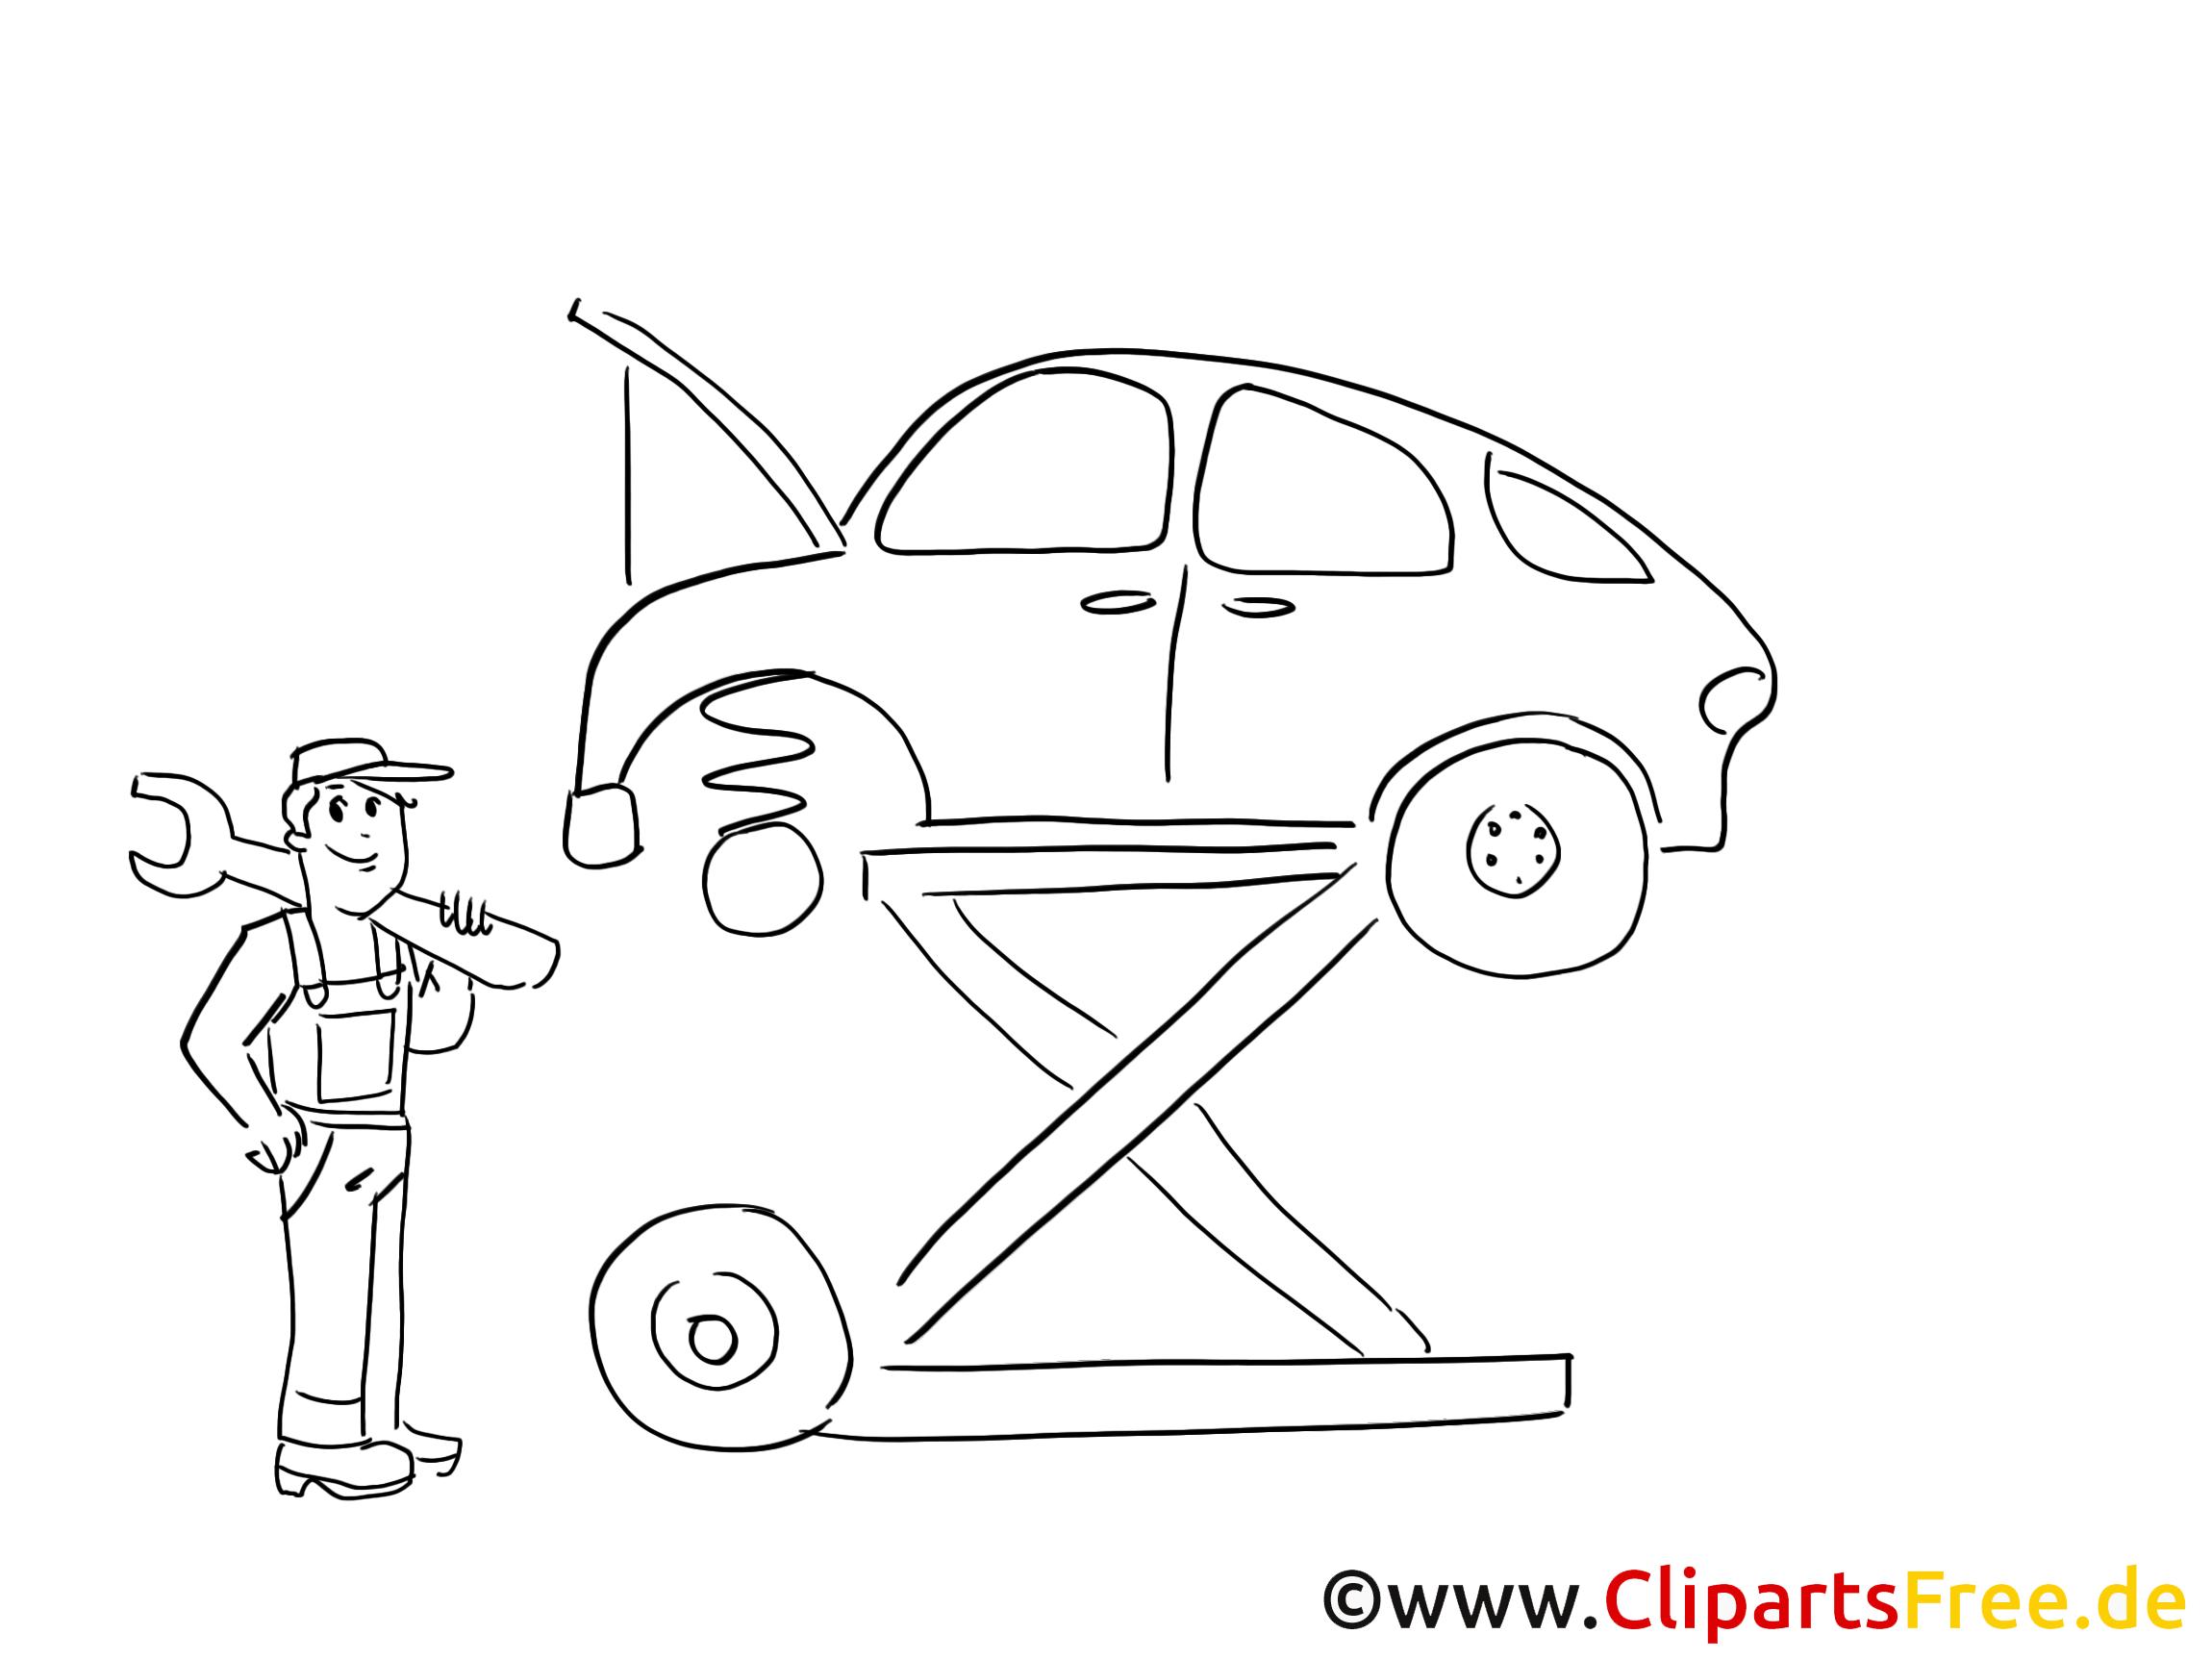 Vehicle repair clip art, graphic, pic, cartoon, comic free